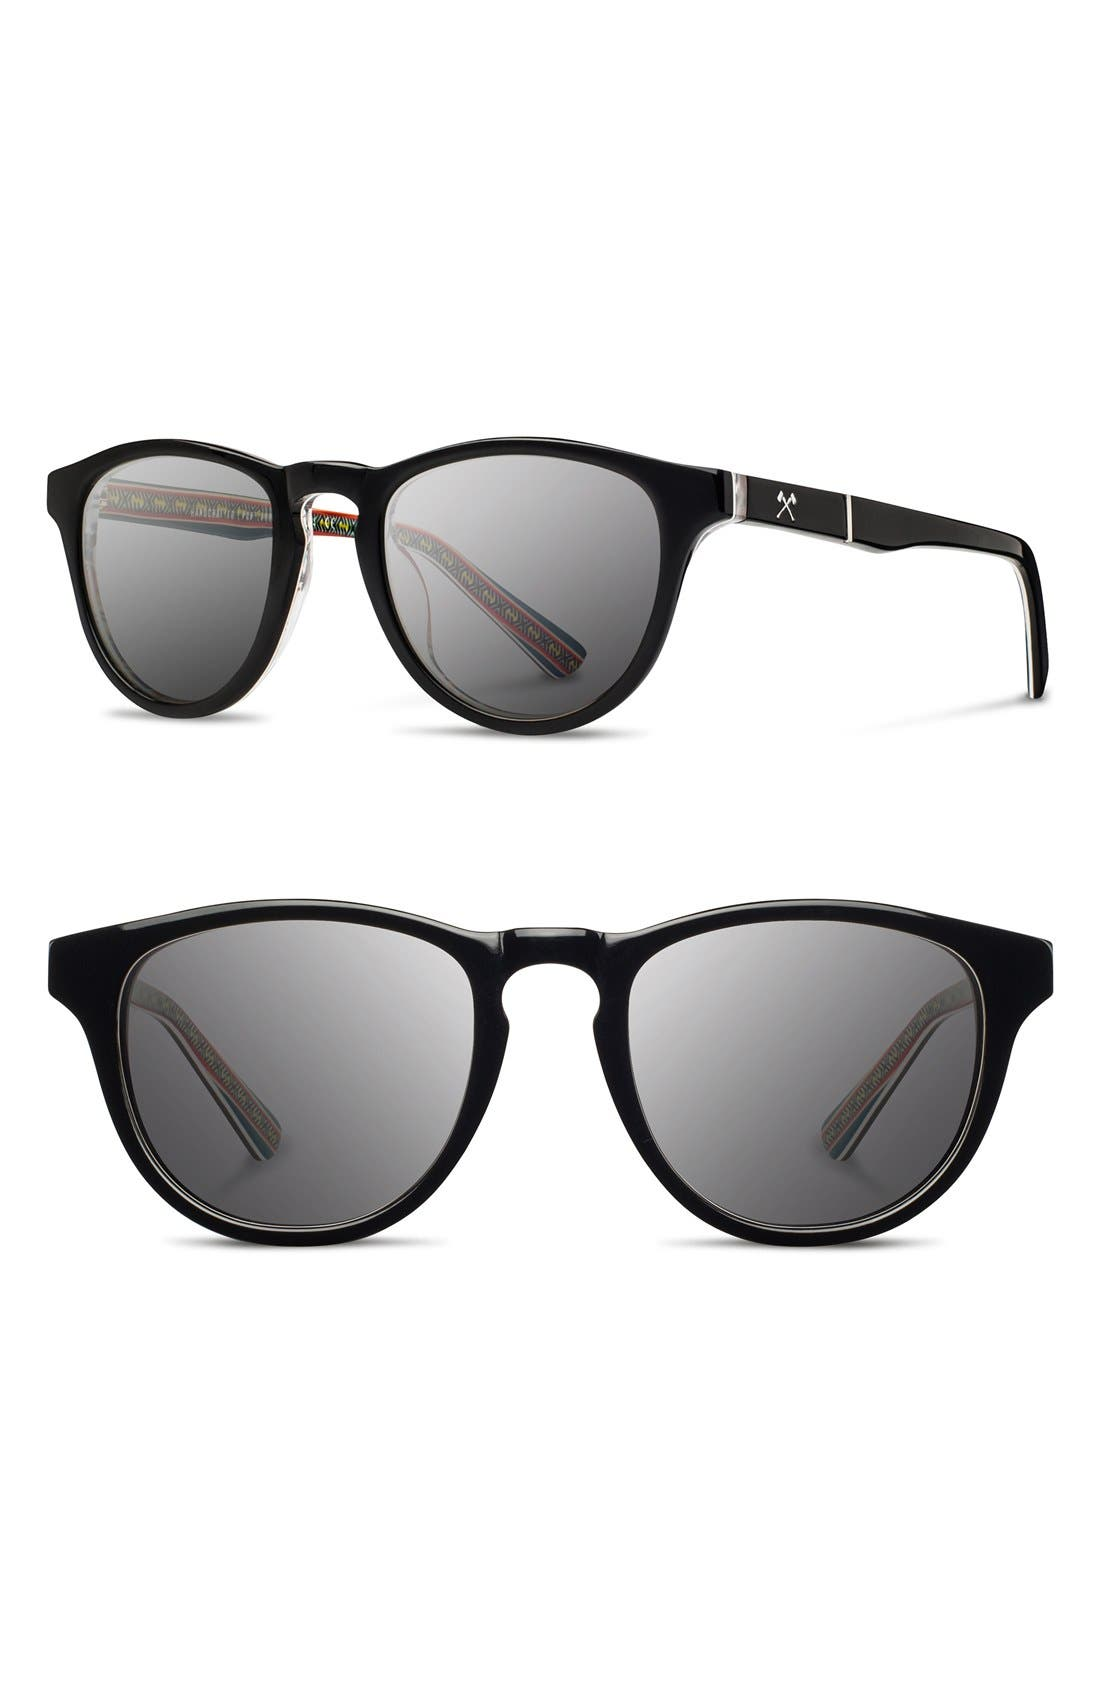 'Francis - Pendleton' 48mm Polarized Sunglasses,                         Main,                         color, Black/ Turquoise Serape/ Grey